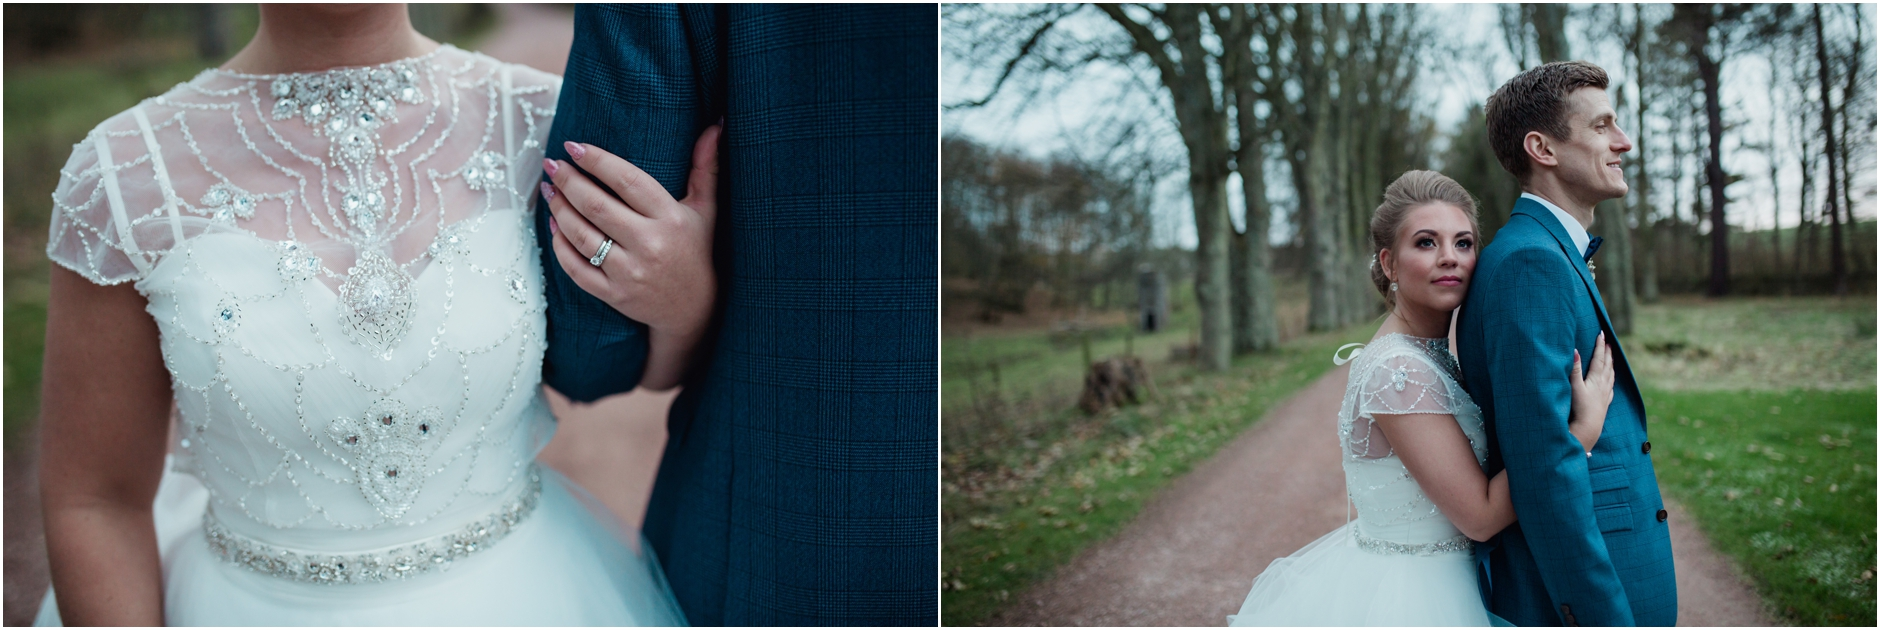 kinkell byre winter barn wedding st andrews scotland